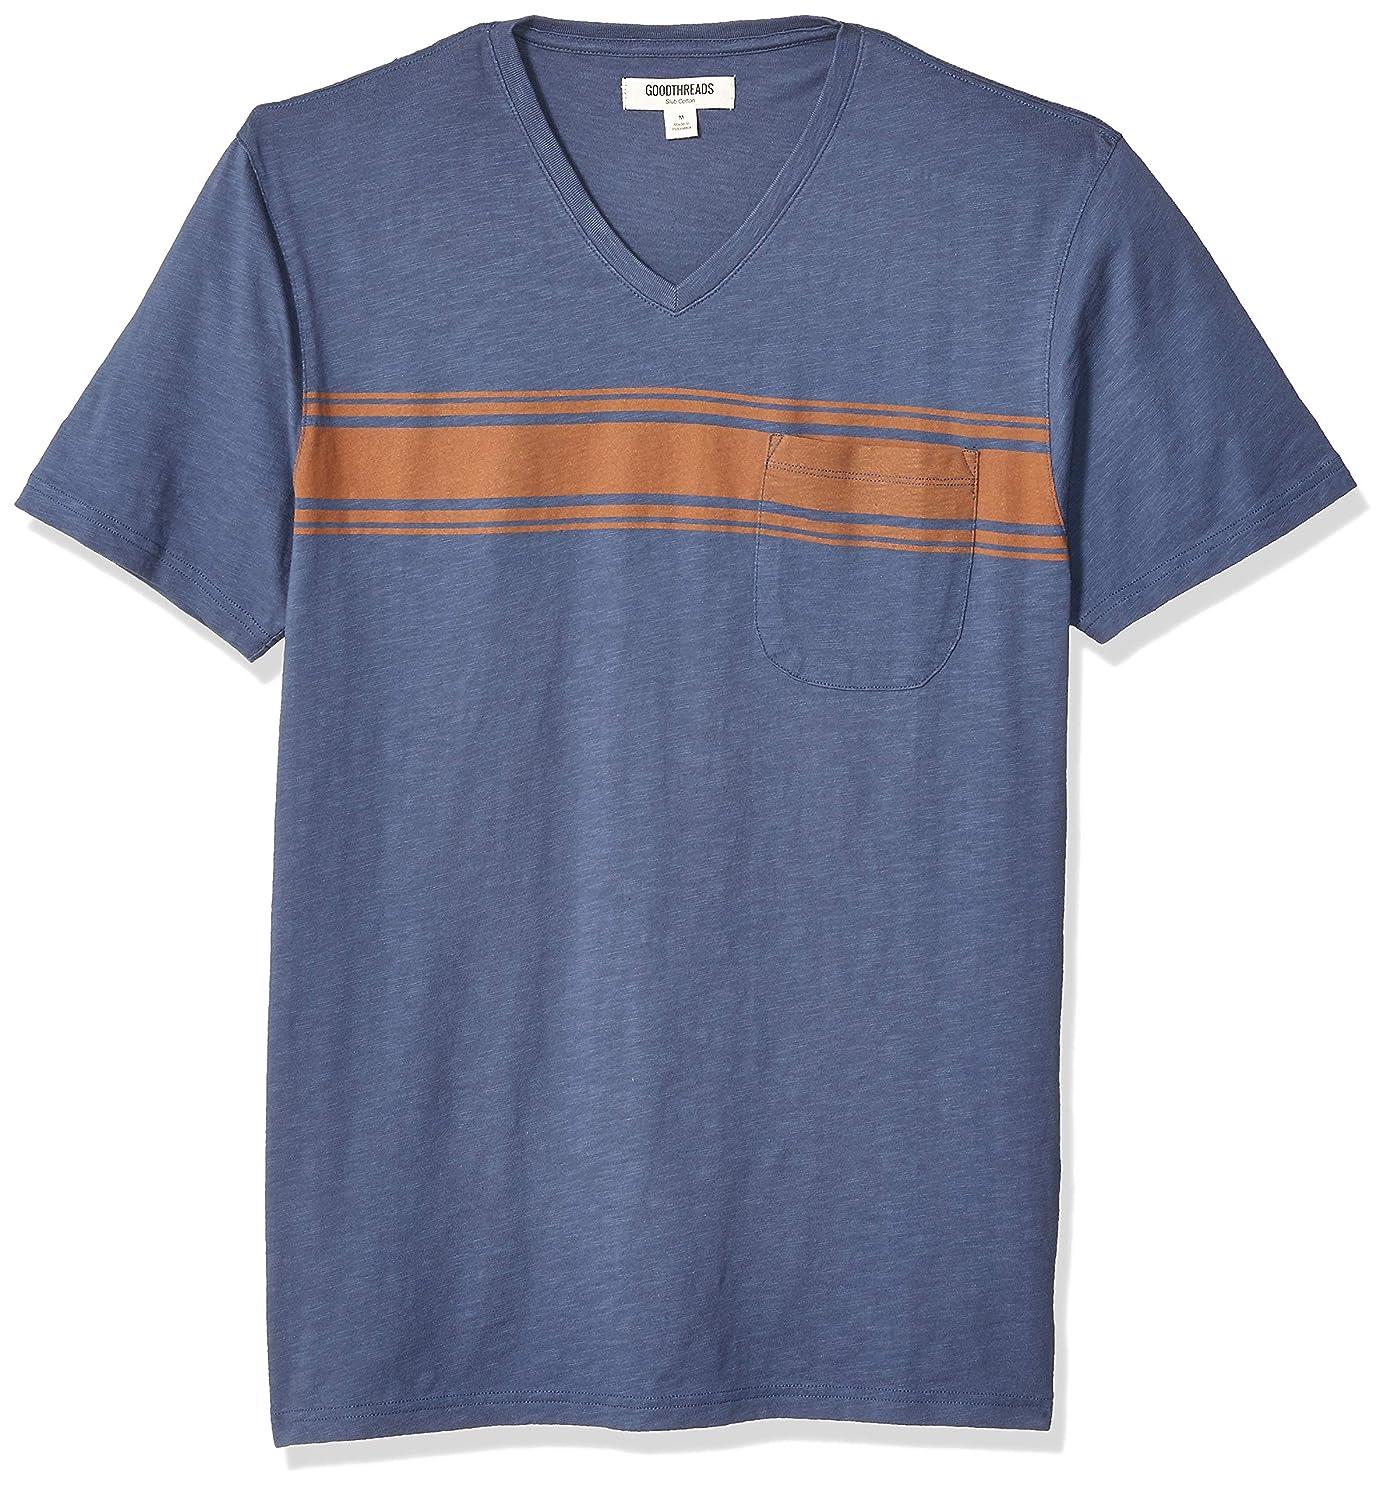 Goodthreads Men's Slub Placed-Stripe V-Neck T-Shirt